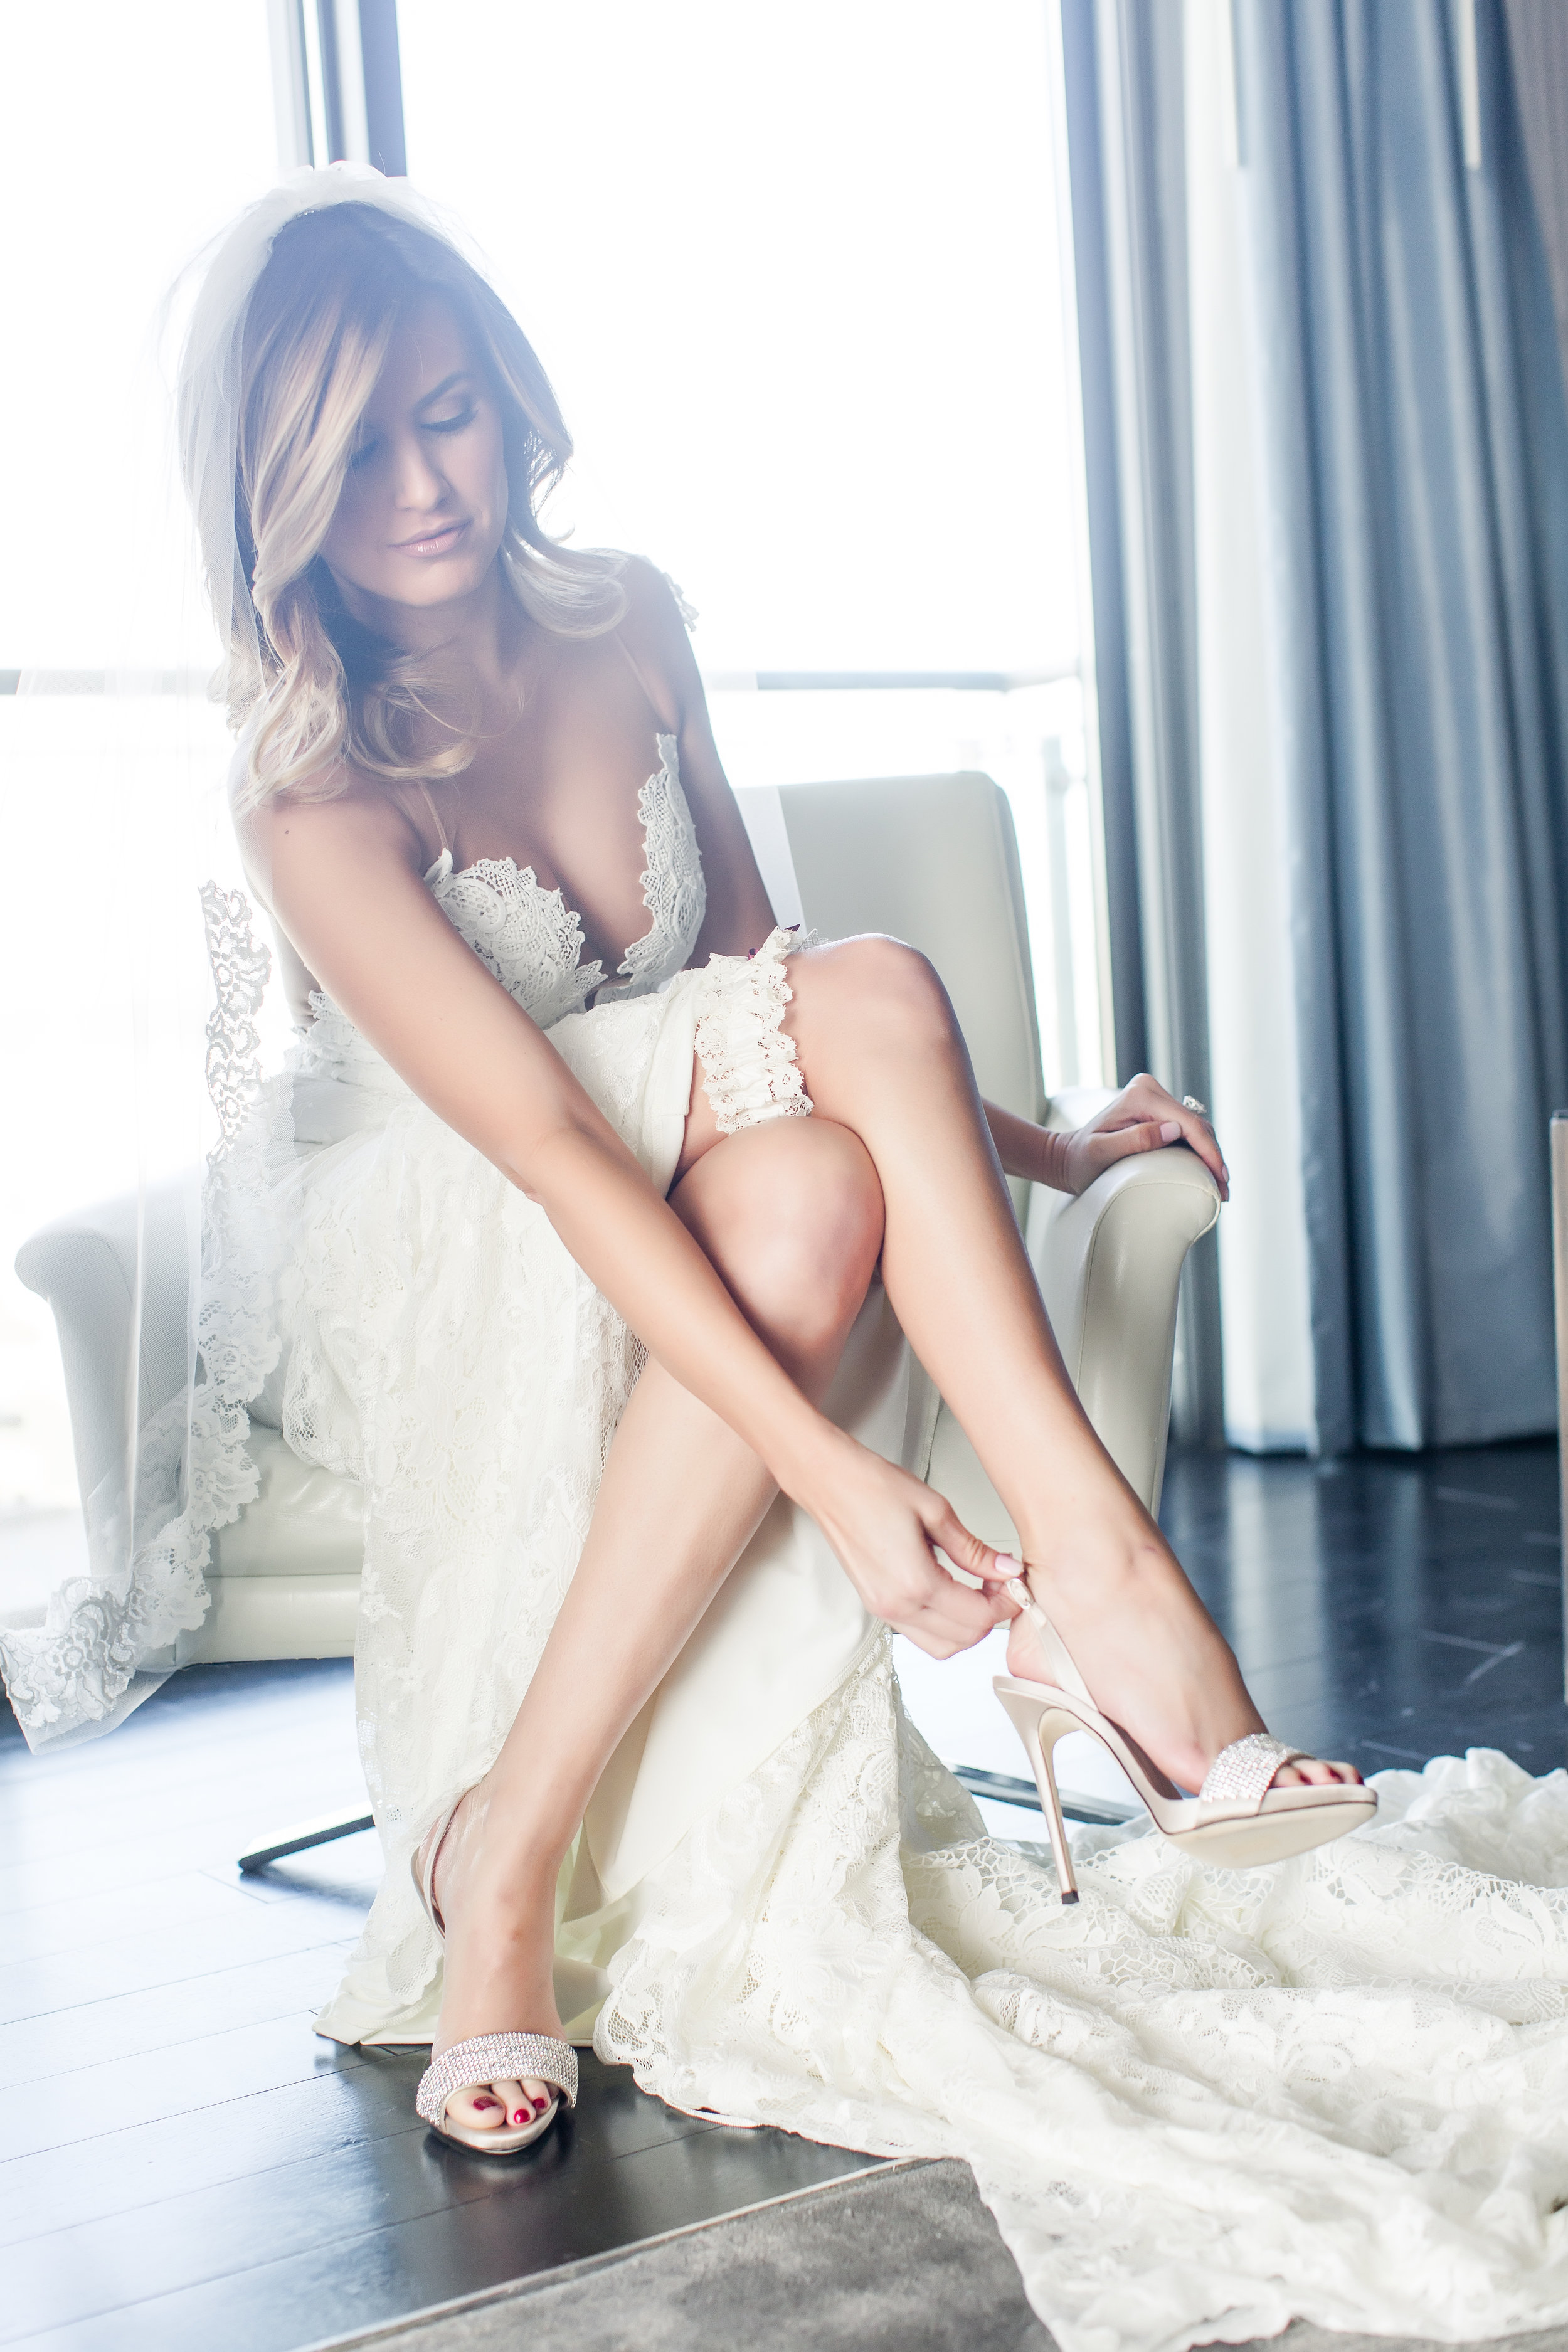 wedding shoes, high heels guiseppe zanotti, wedding day prep, wedding dress, wedding gown